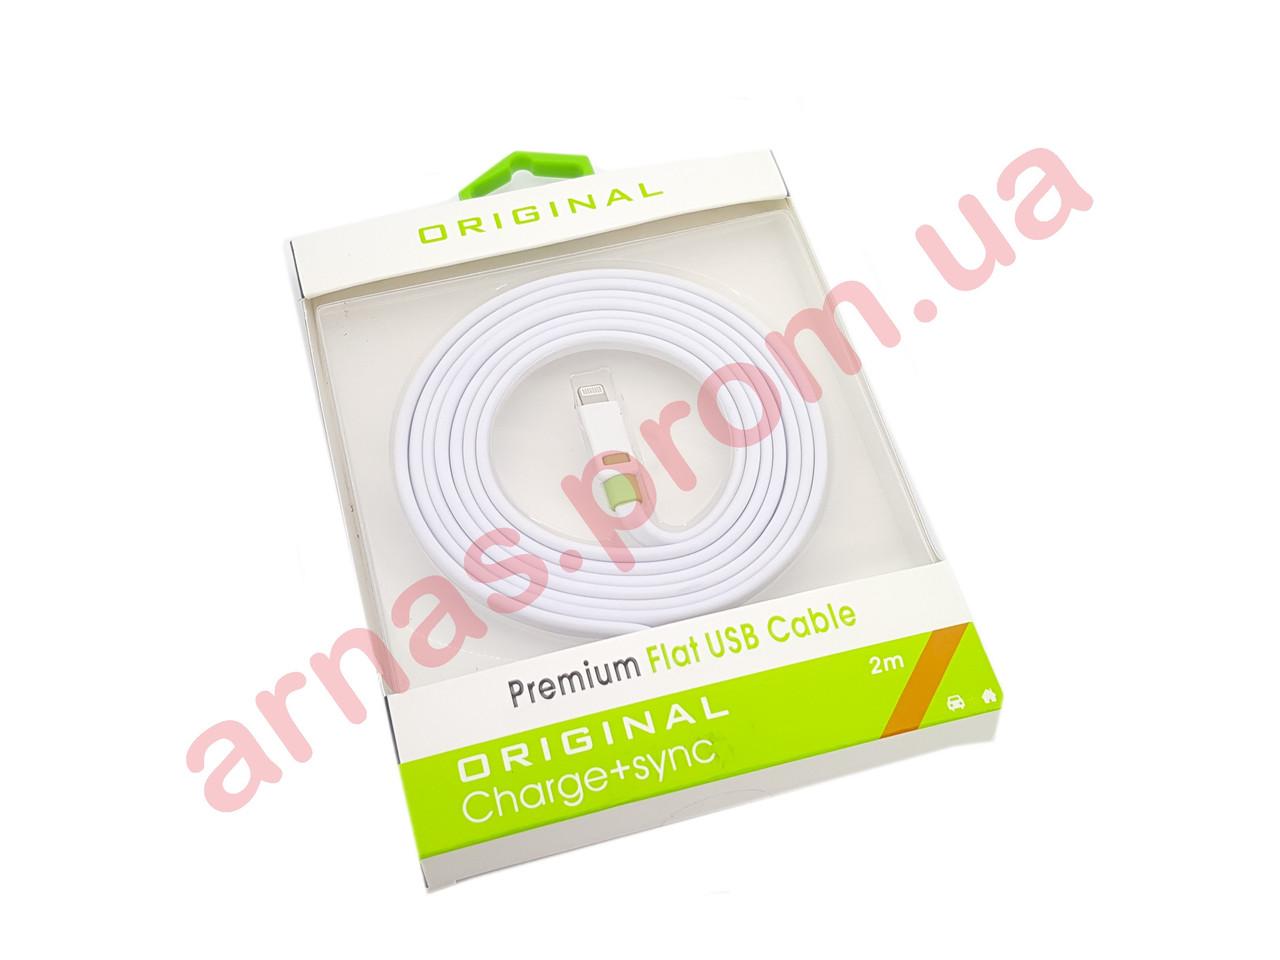 Шнур кабель Premium Flat USB 2m для Iphone